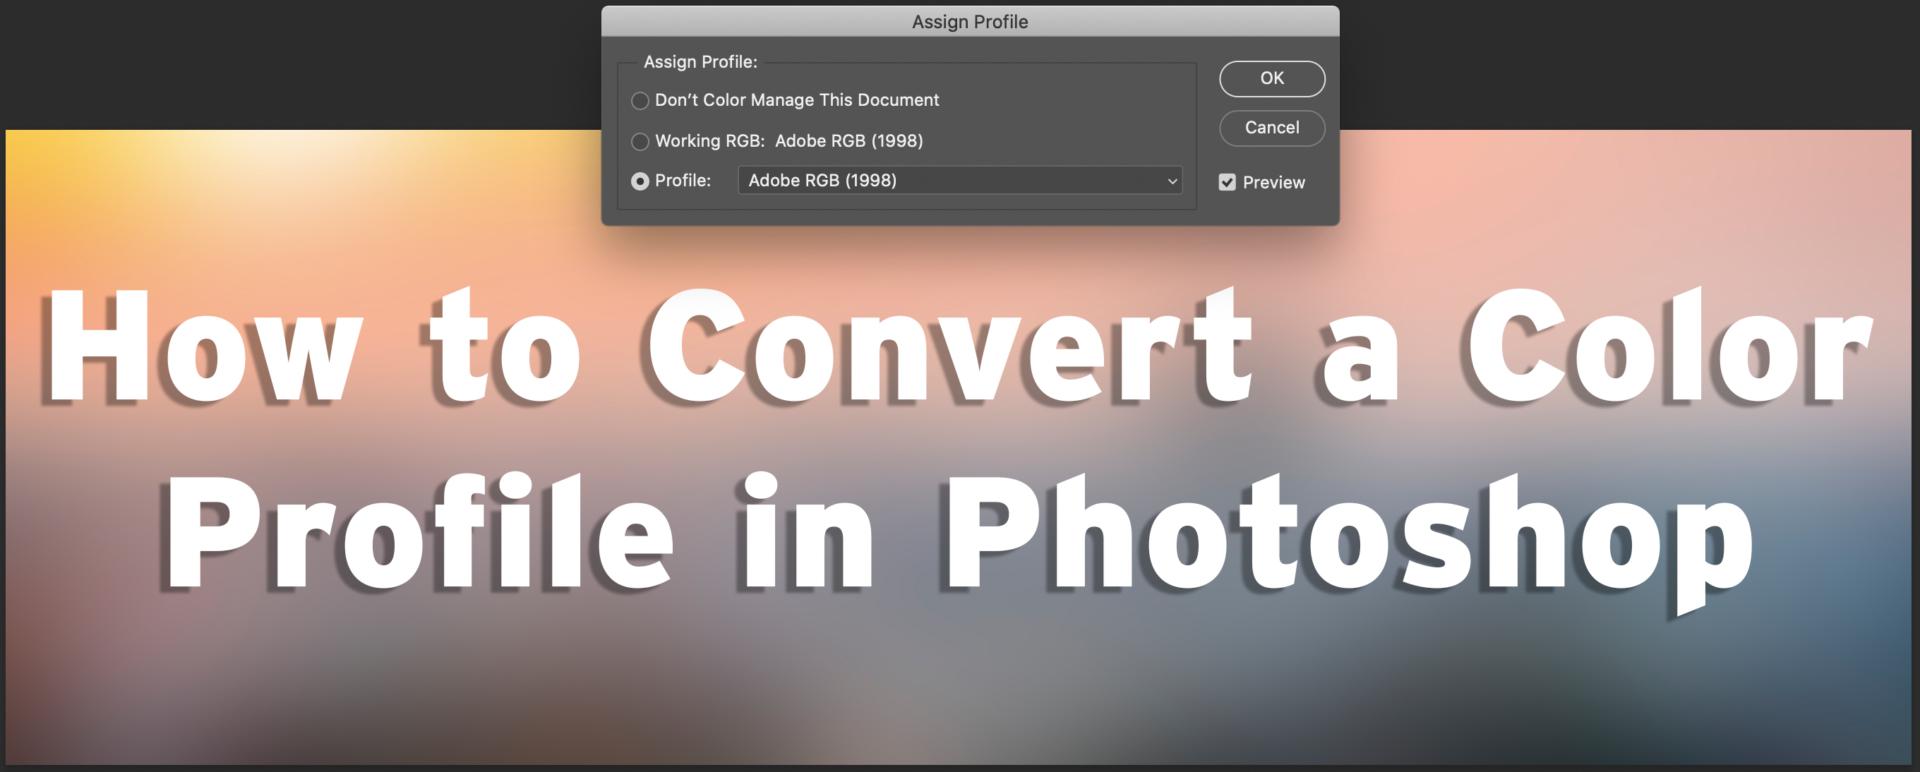 Example of Adobe RGB